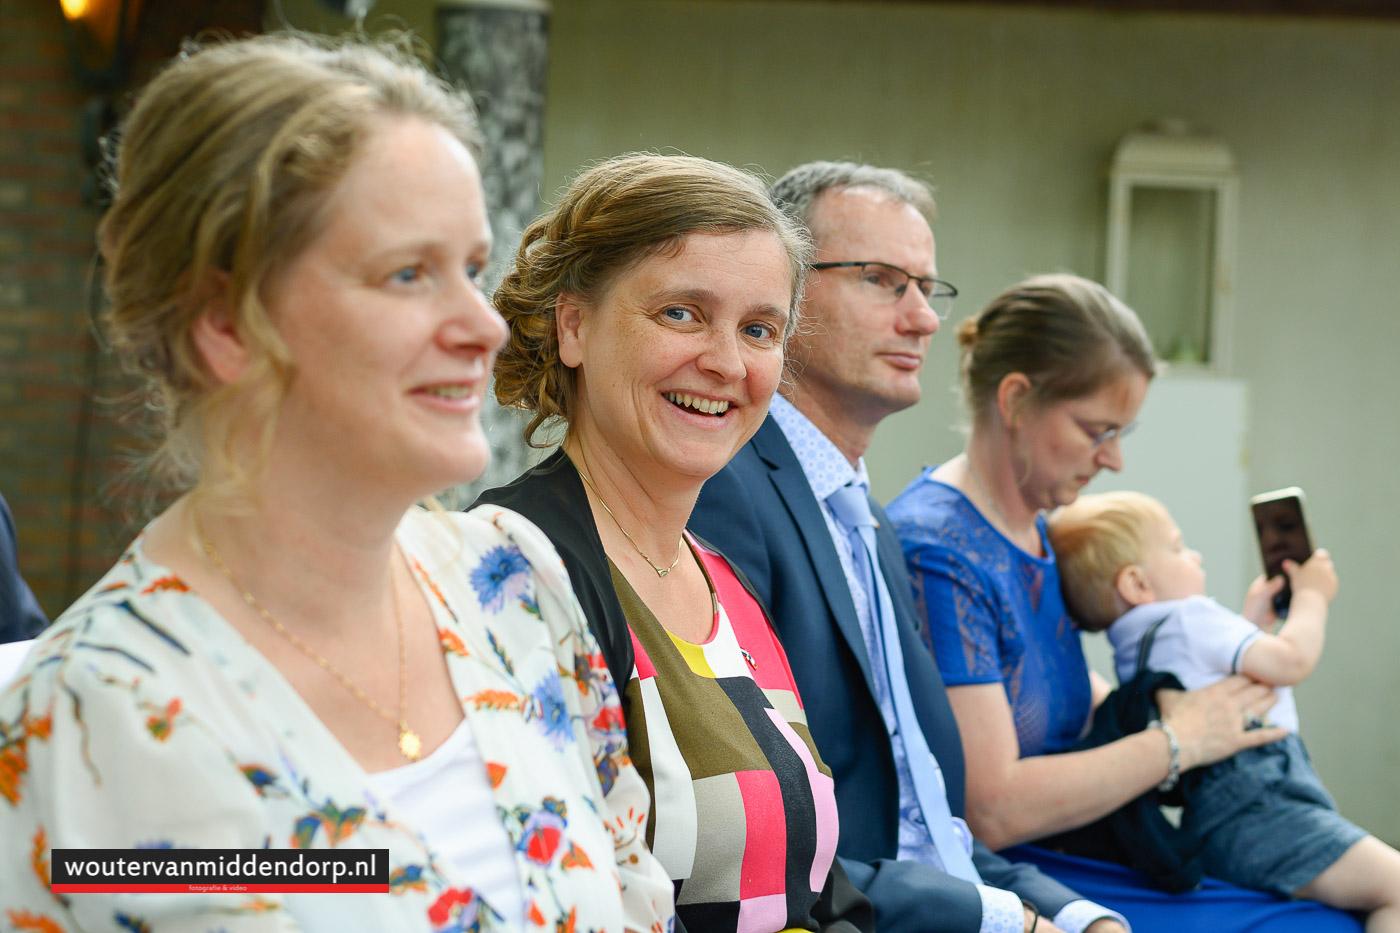 bruidsfotografie Wouter van Middendorp Uddel, Gorinchem, Ridderkerk-28